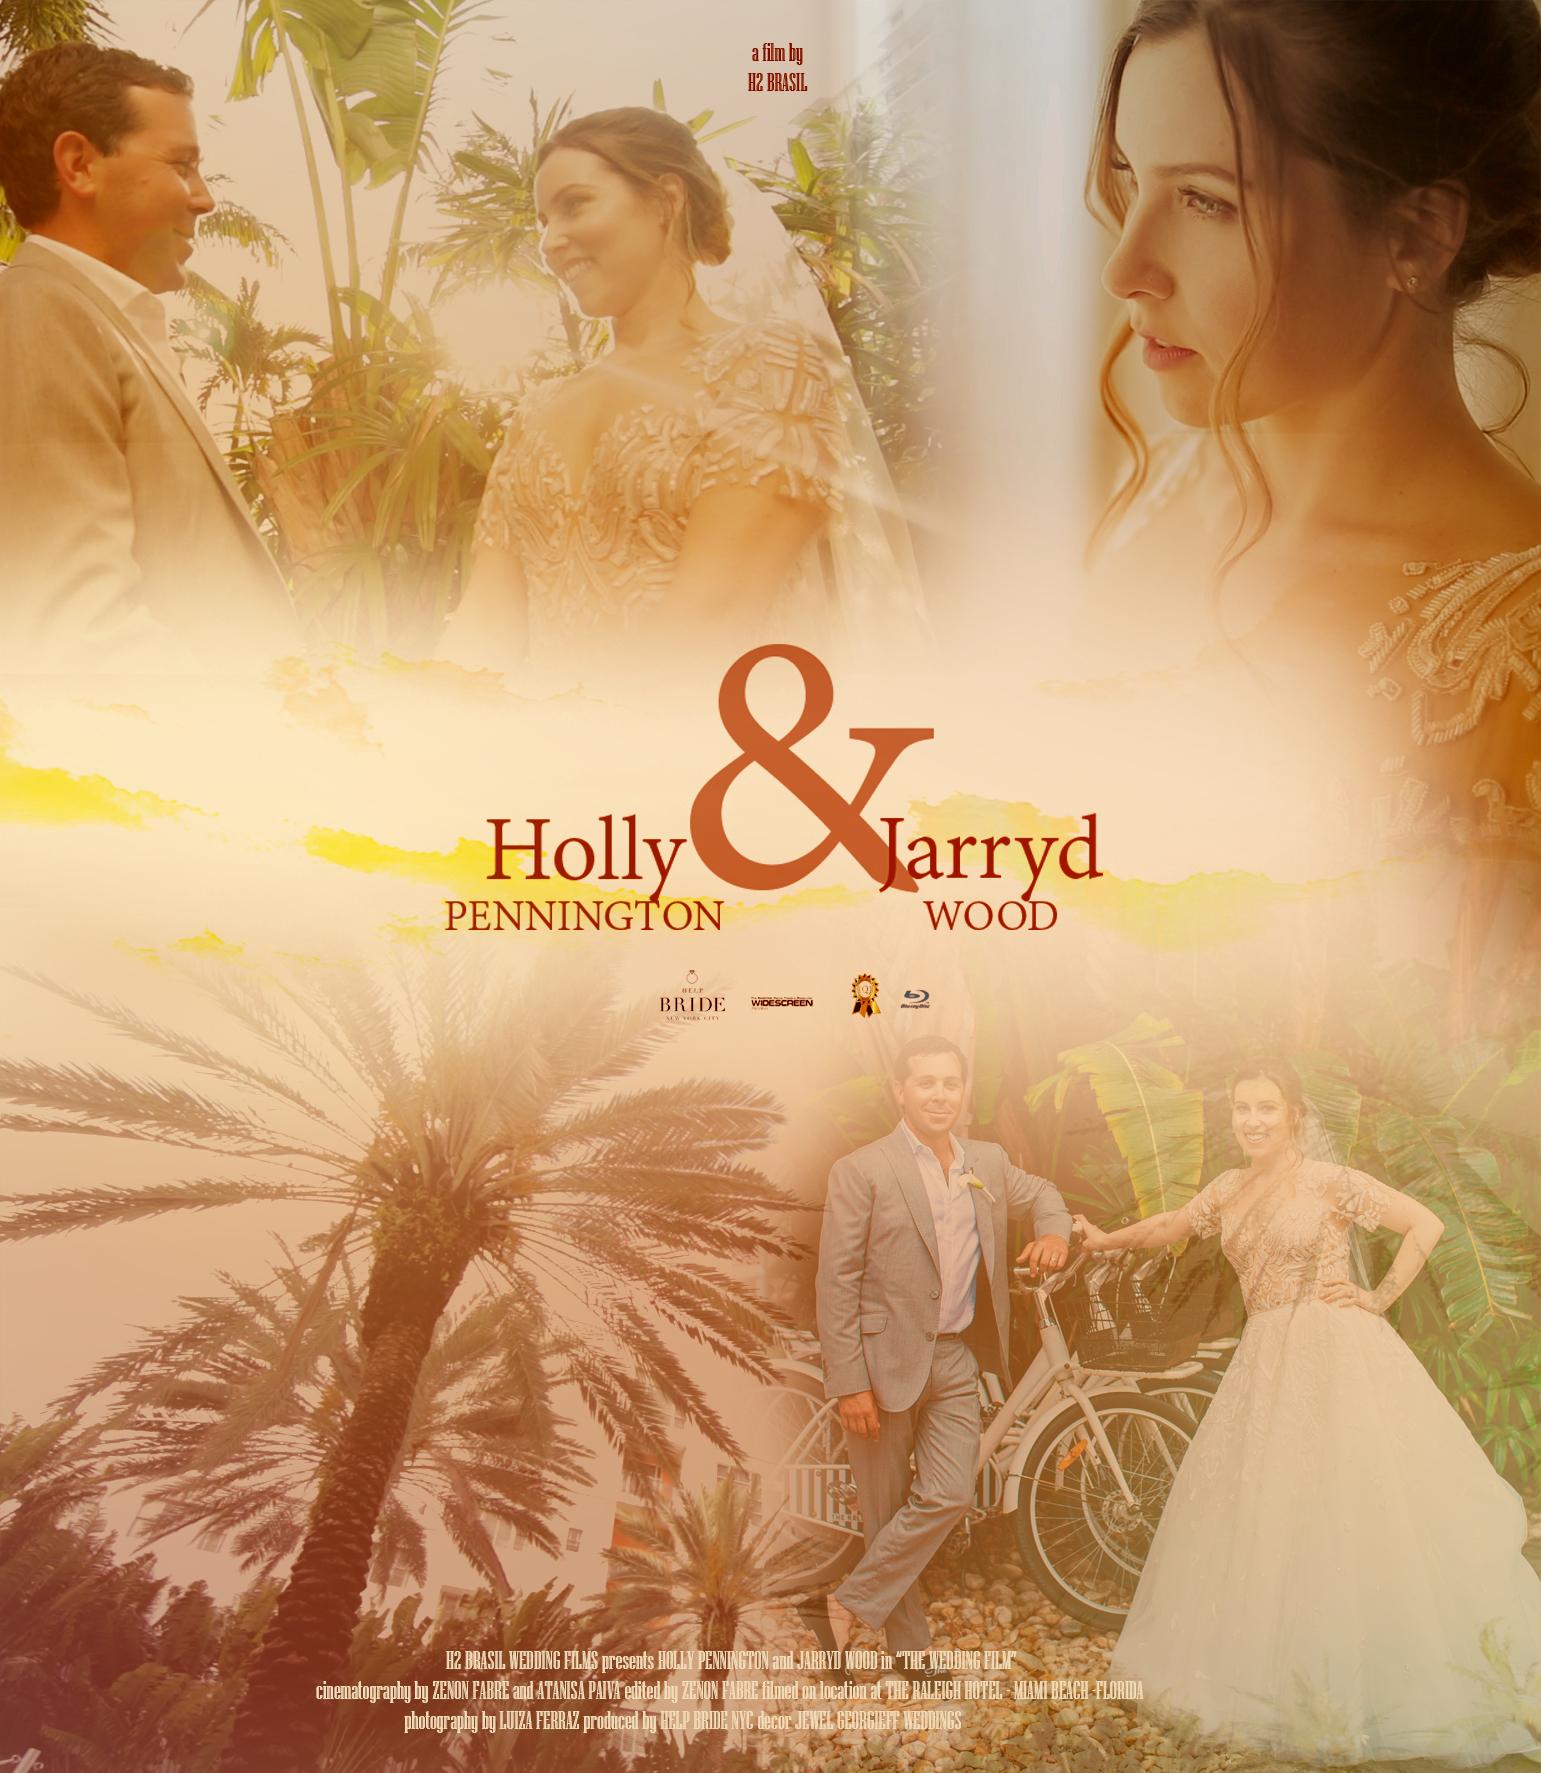 Raleigh Hotel Wedding - VENDORS:Film: H2 BRAZIL WEDDING FILMS Photography: LUIZA FERRAZ Wedding Planning: HELP BRIDE NYC Wedding Design: JEWEL GEORGIEFF WEDDINGS Venue: THE RALEIGH SOUTH BEACH MIAMI Wedding Dress: ZUHAIR MURAD Groom`s Suit: SUIT SUPPLY Cake & Sweets: EARTH & SUGAR Band: BAY KINGS BAND Tent: NOMAD TENTS